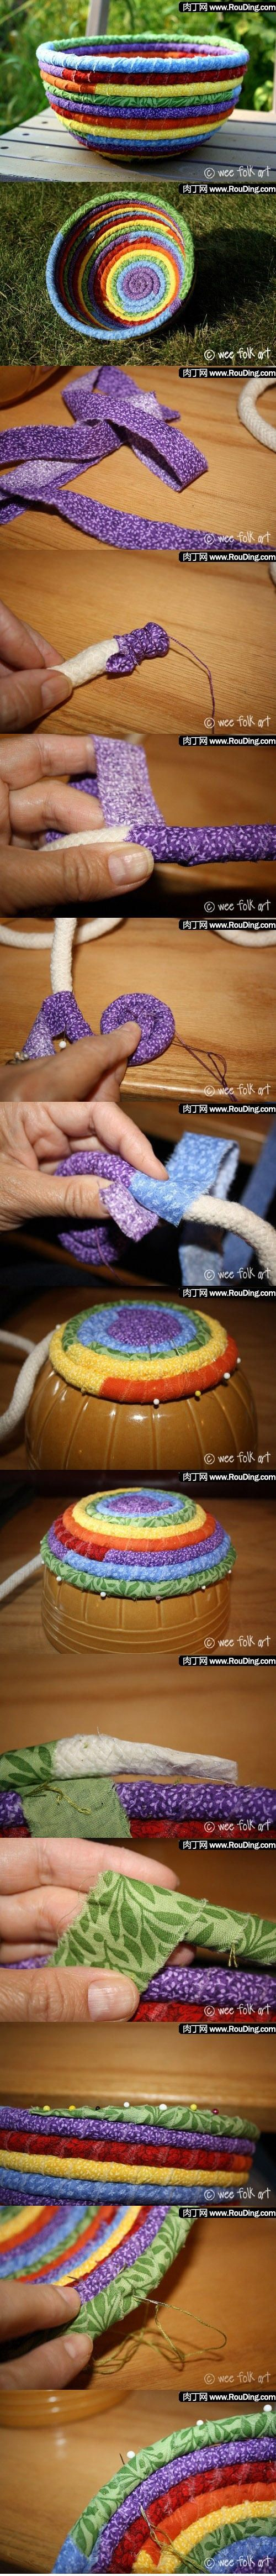 DIY Crafts / How to make a decorative fabric bowl.